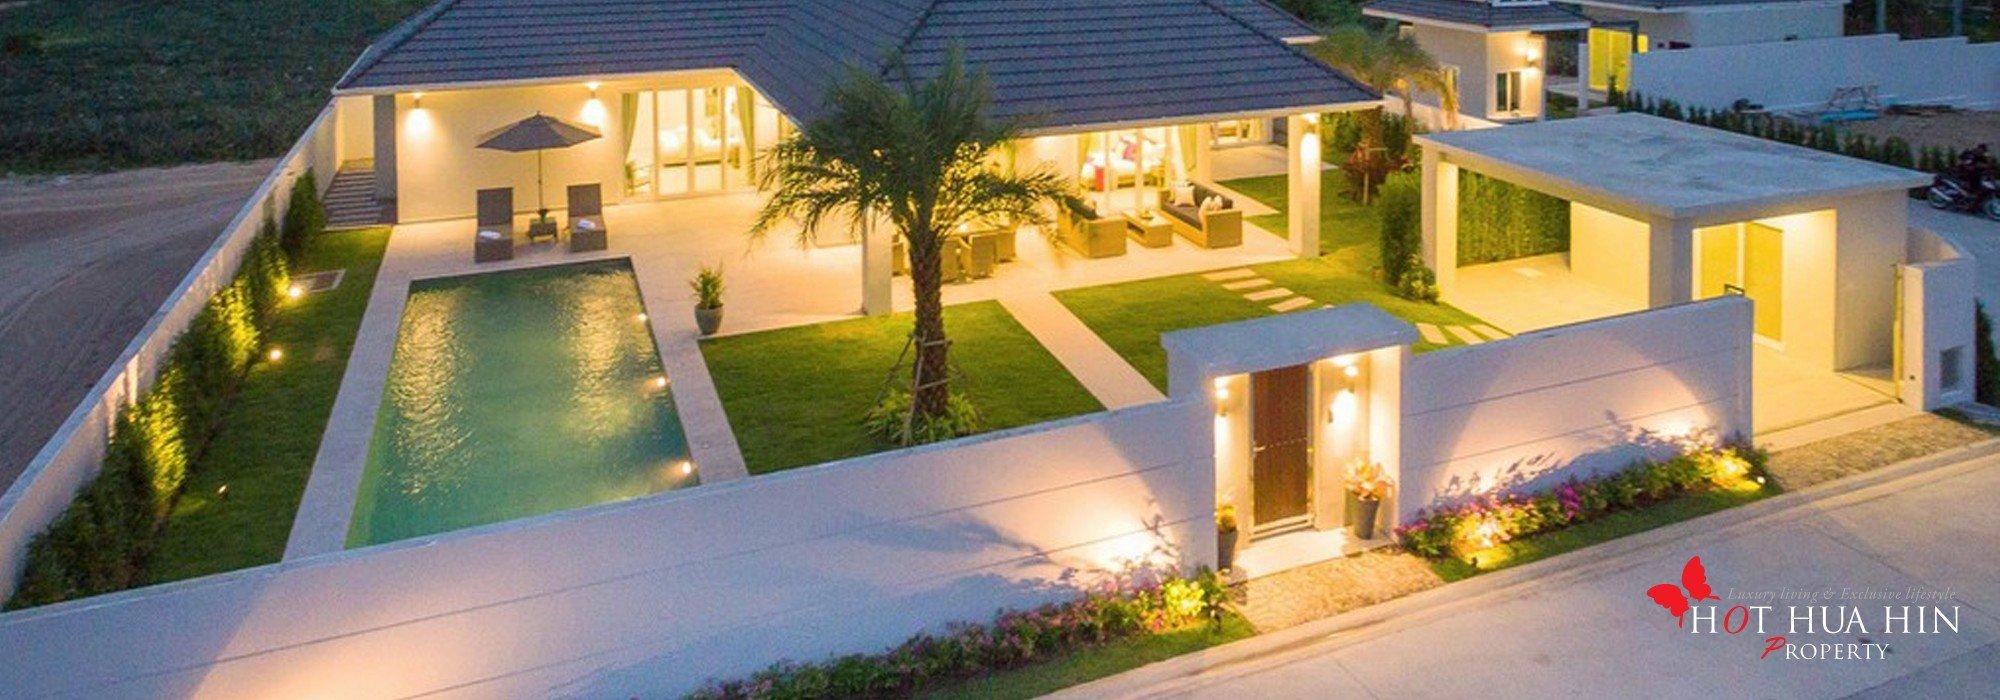 Baan Phu Thara, Hua Hin's fullest featured development